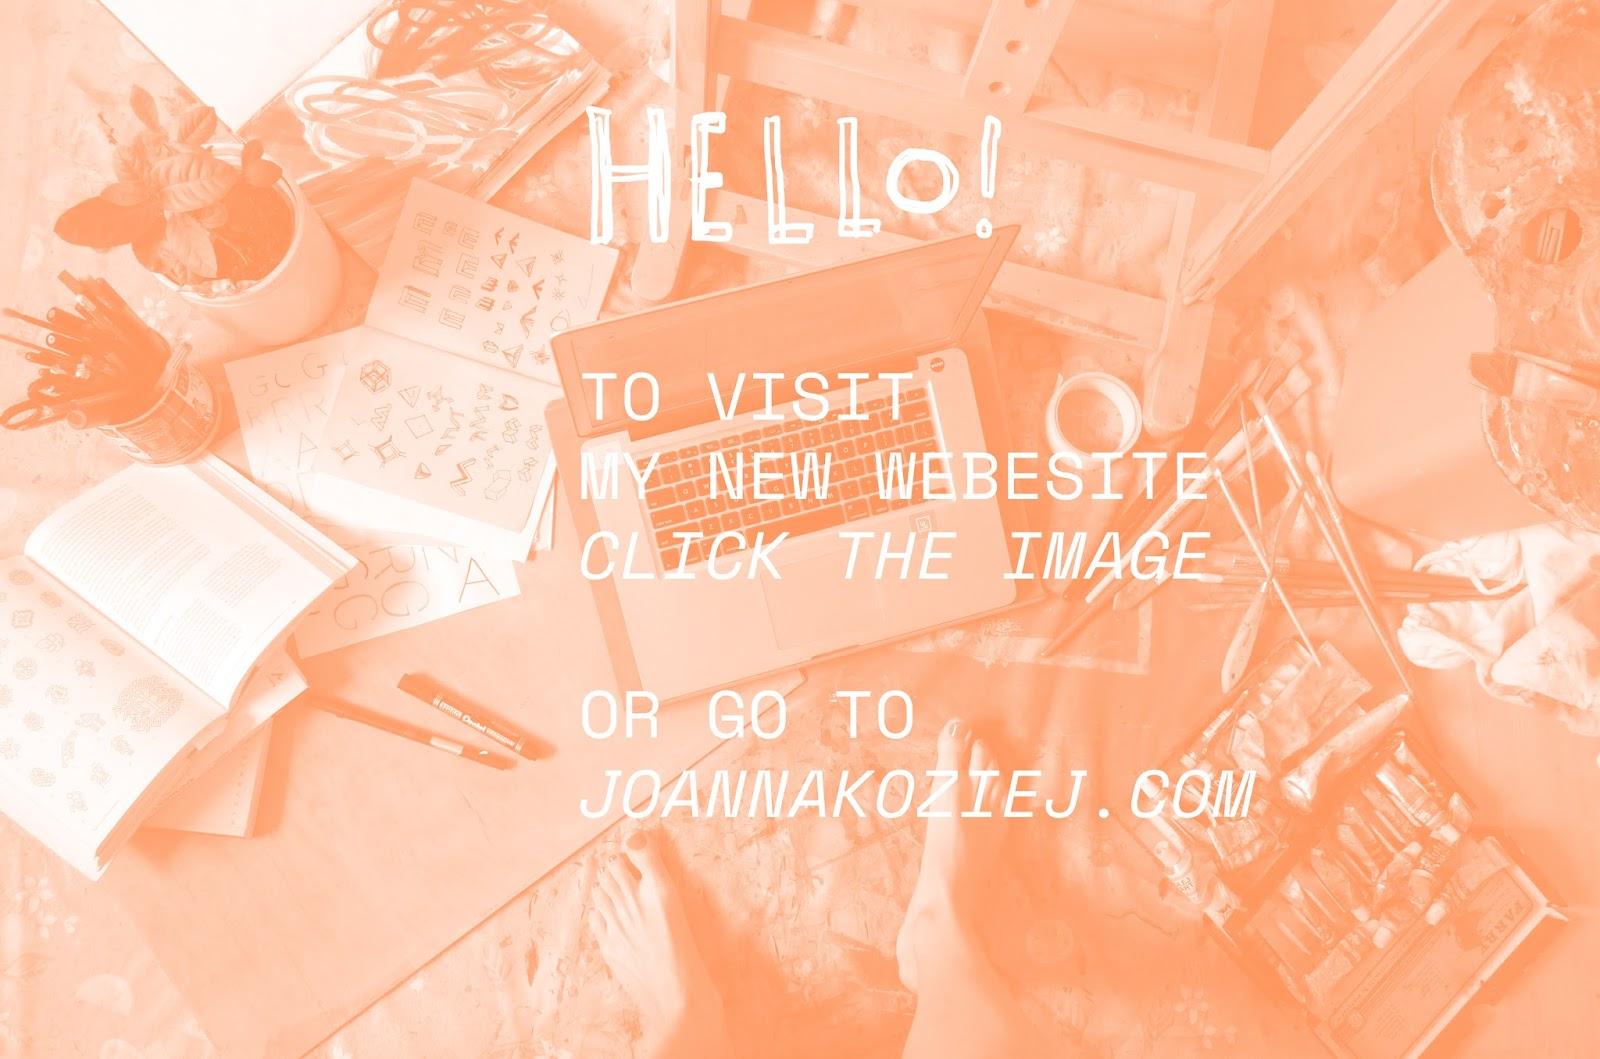 joannakoziej.com